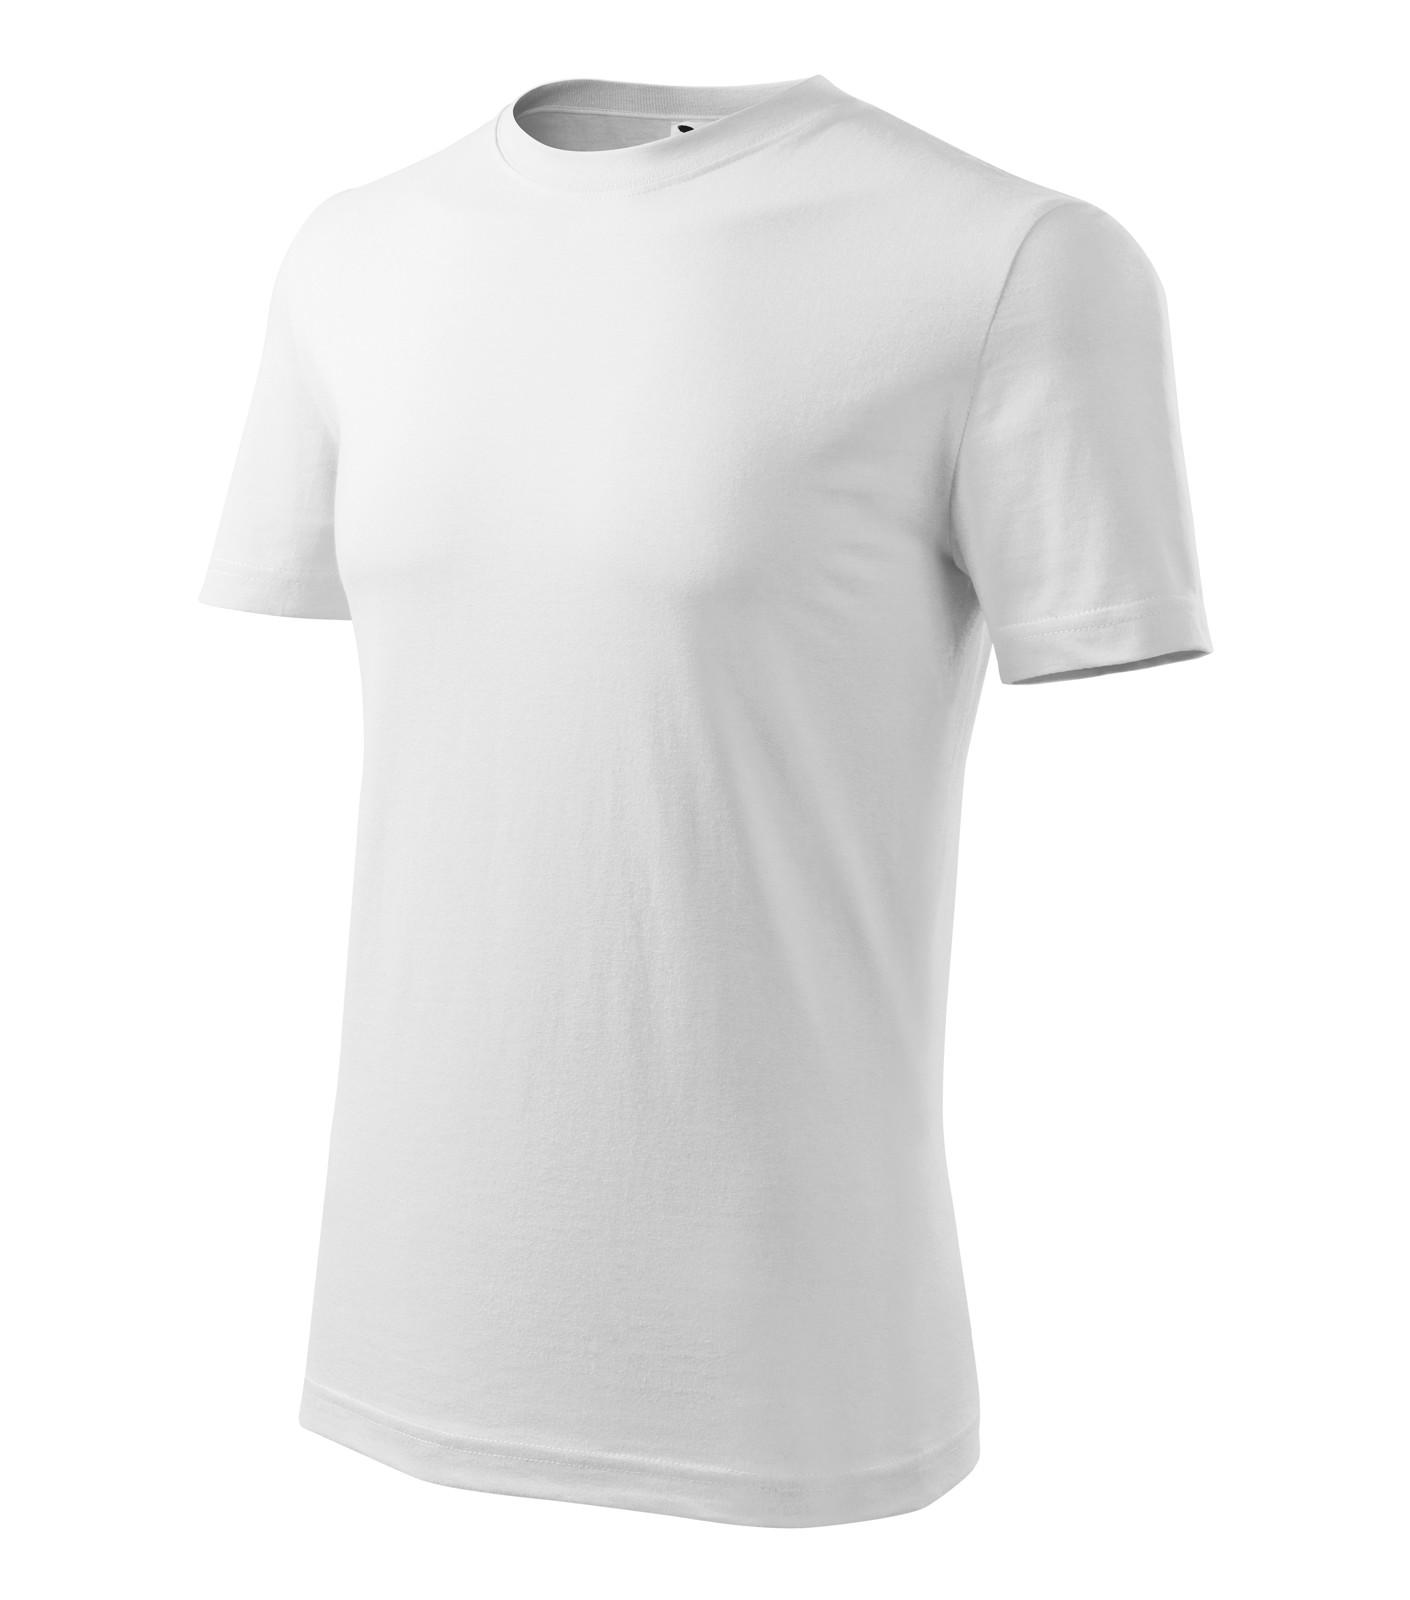 T-shirt men's Malfini Classic New - White / M